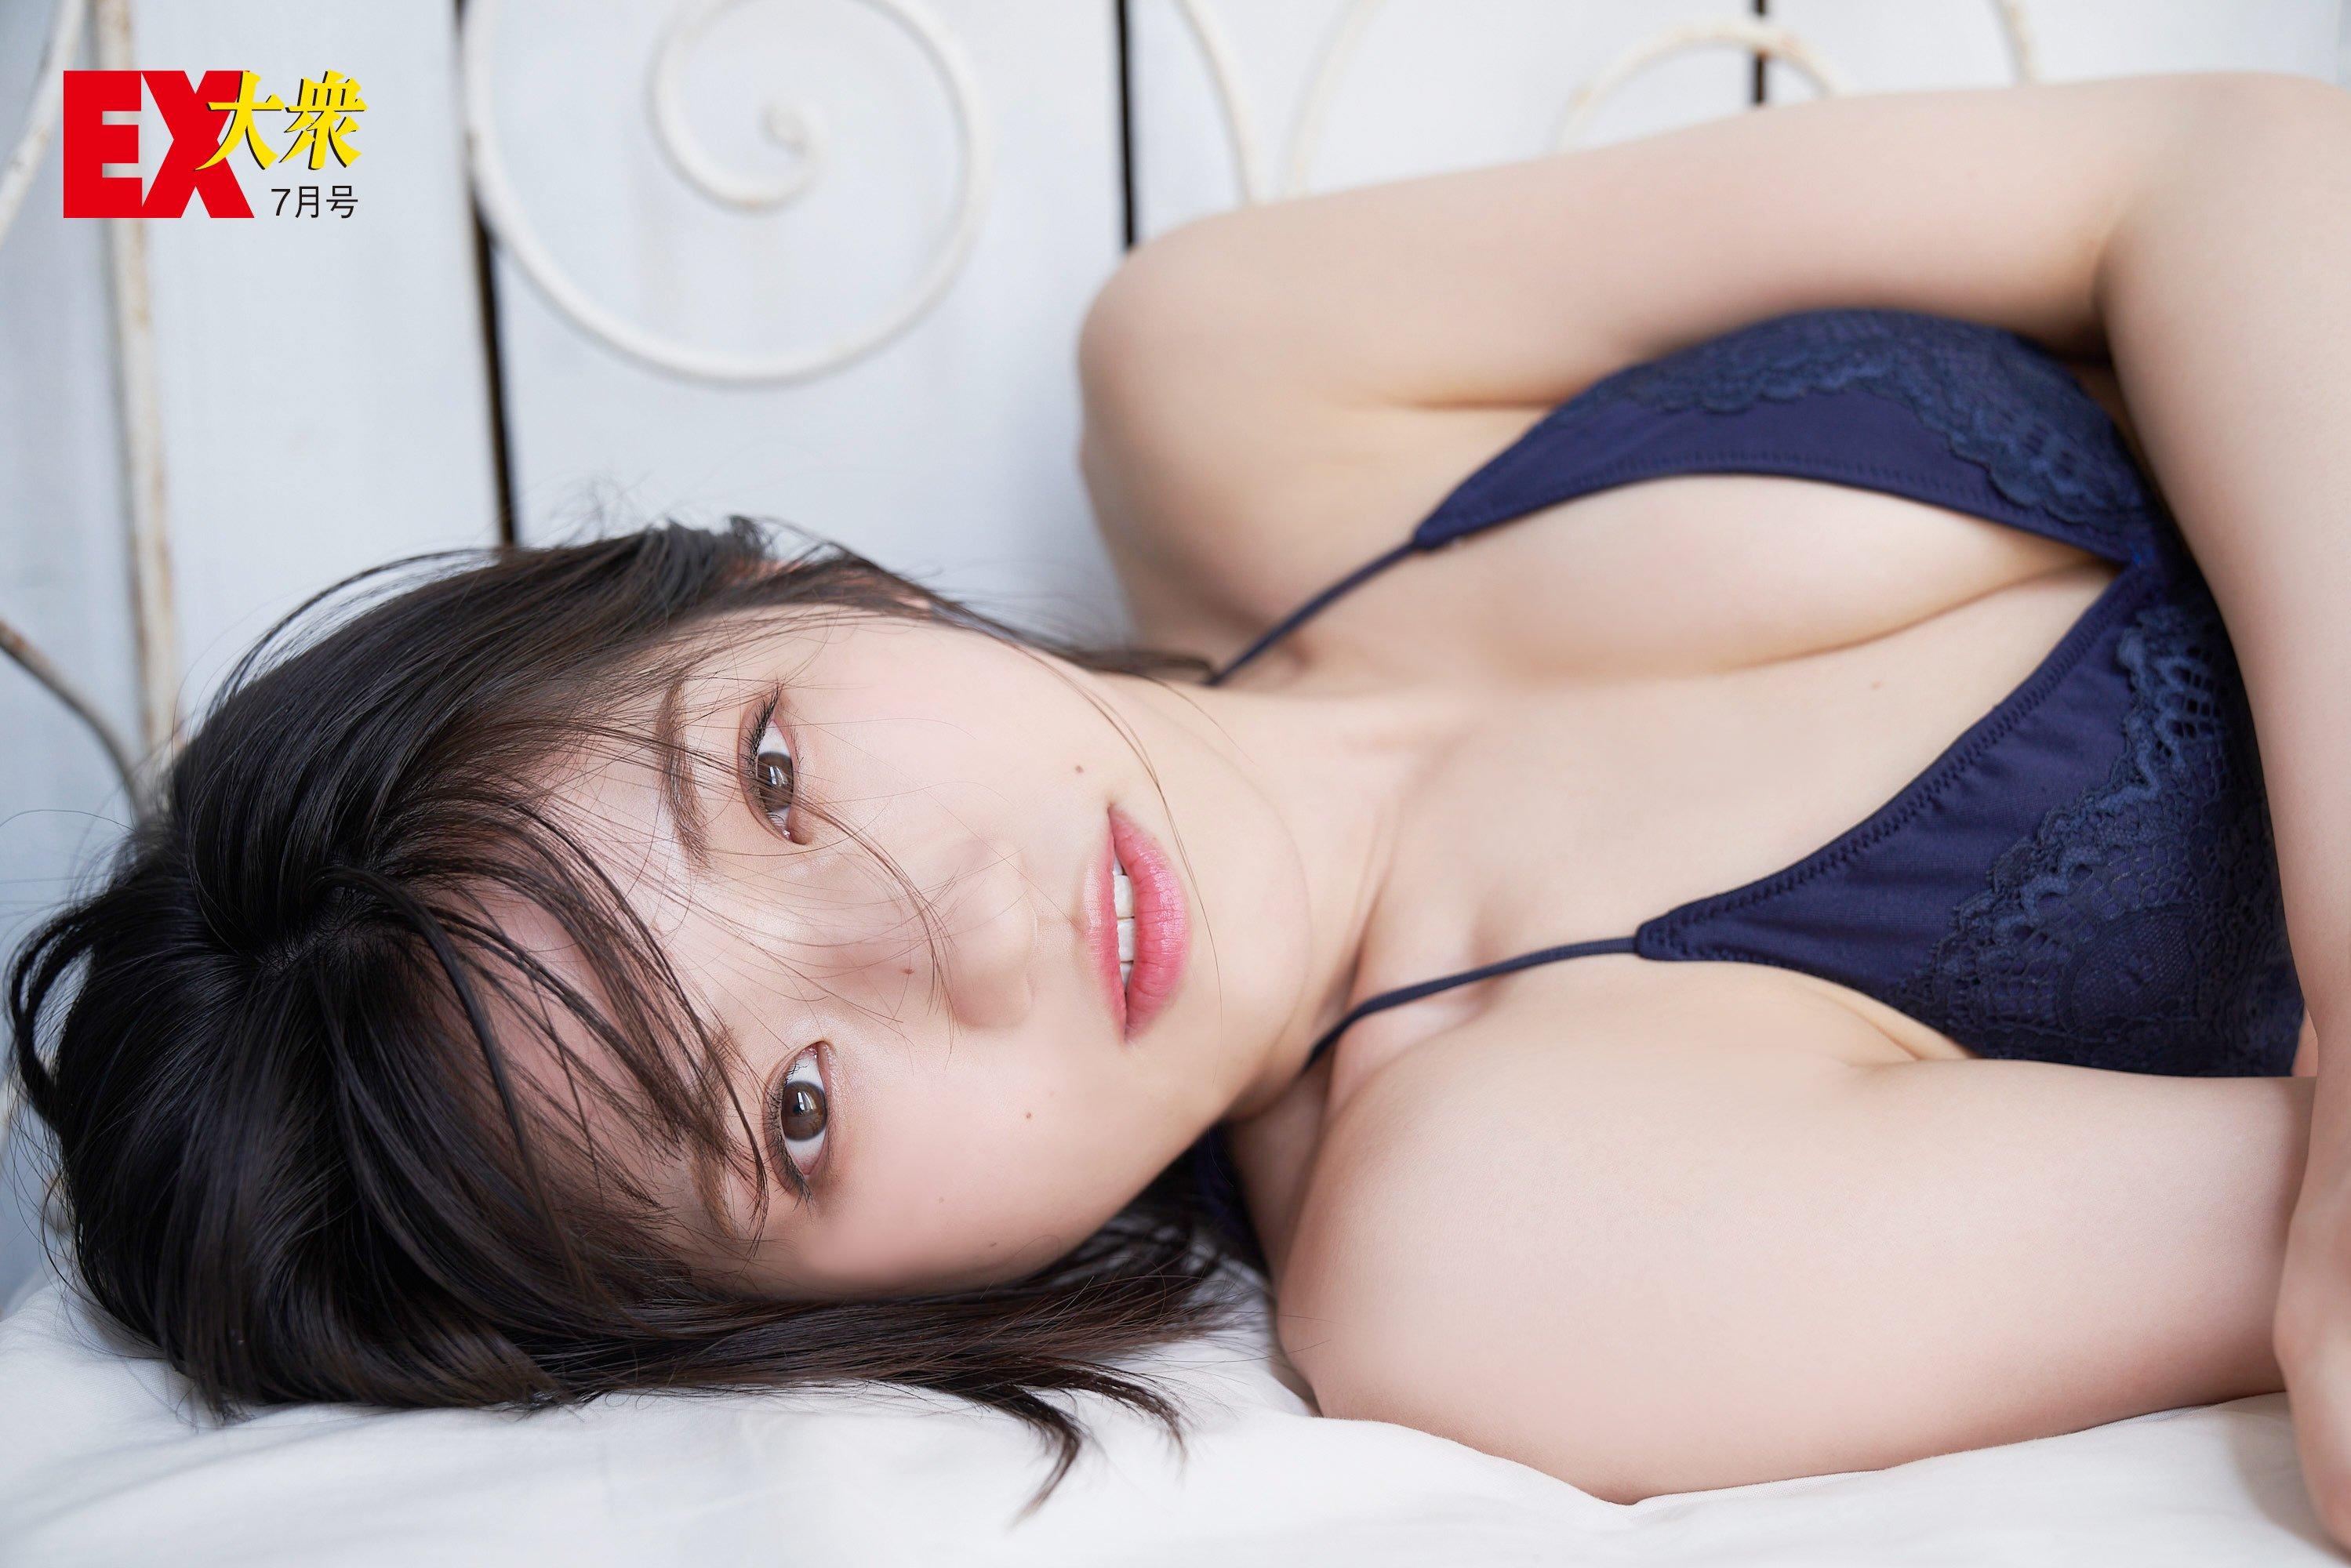 AKB48村山彩希の本誌未掲載カット10枚を大公開!【EX大衆7月号】の画像005